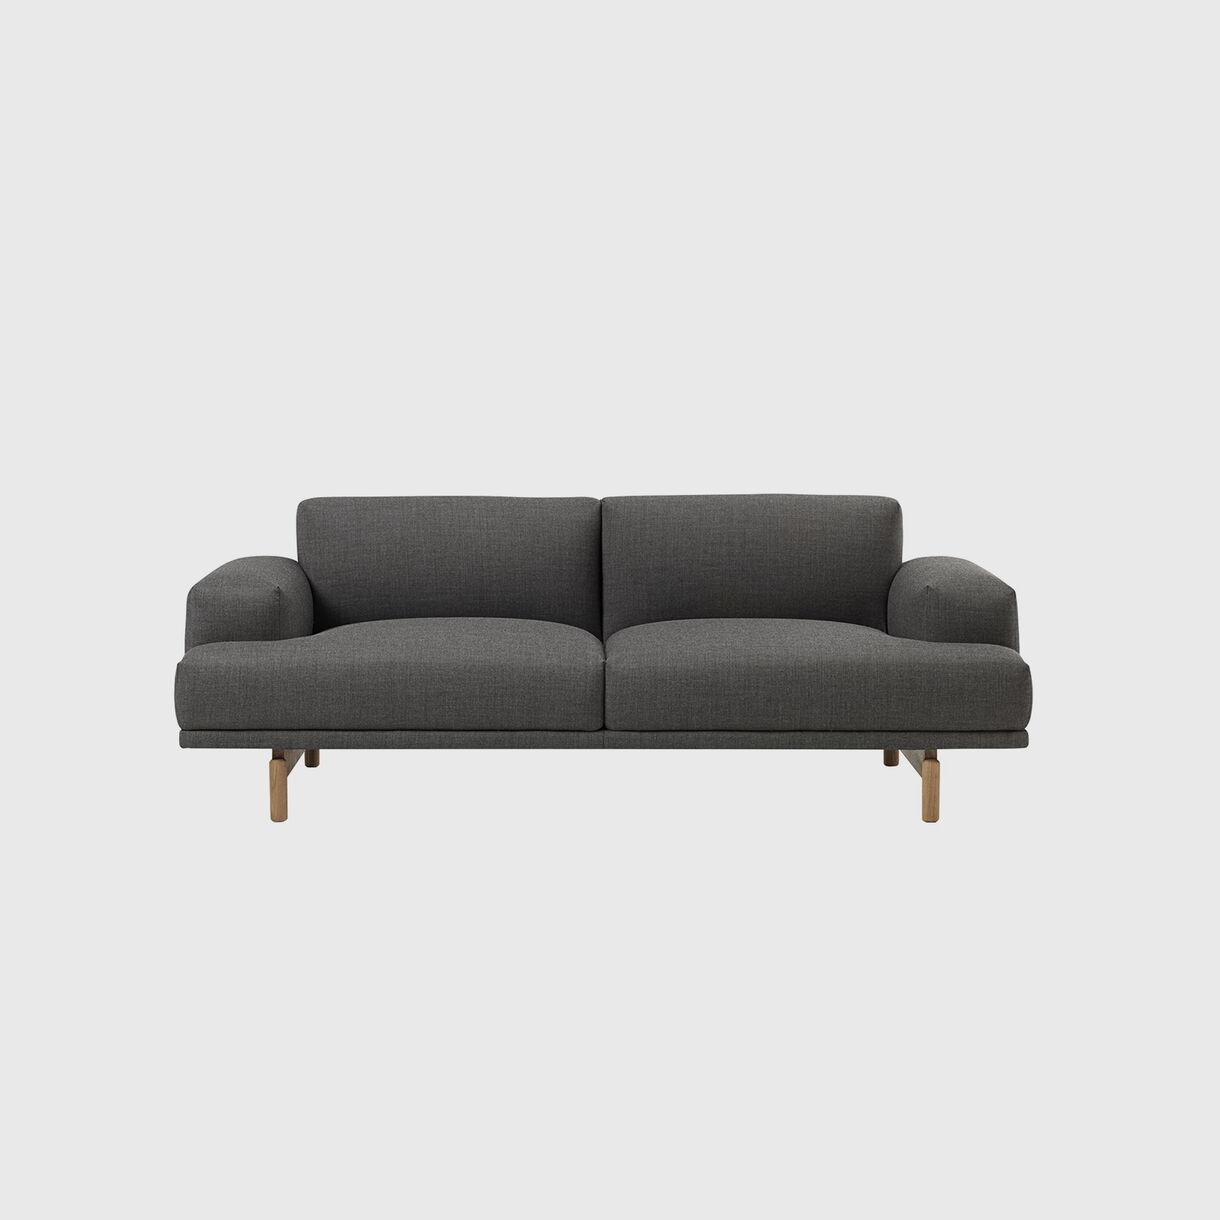 Compose Sofa, 2 Seater, Remix 163